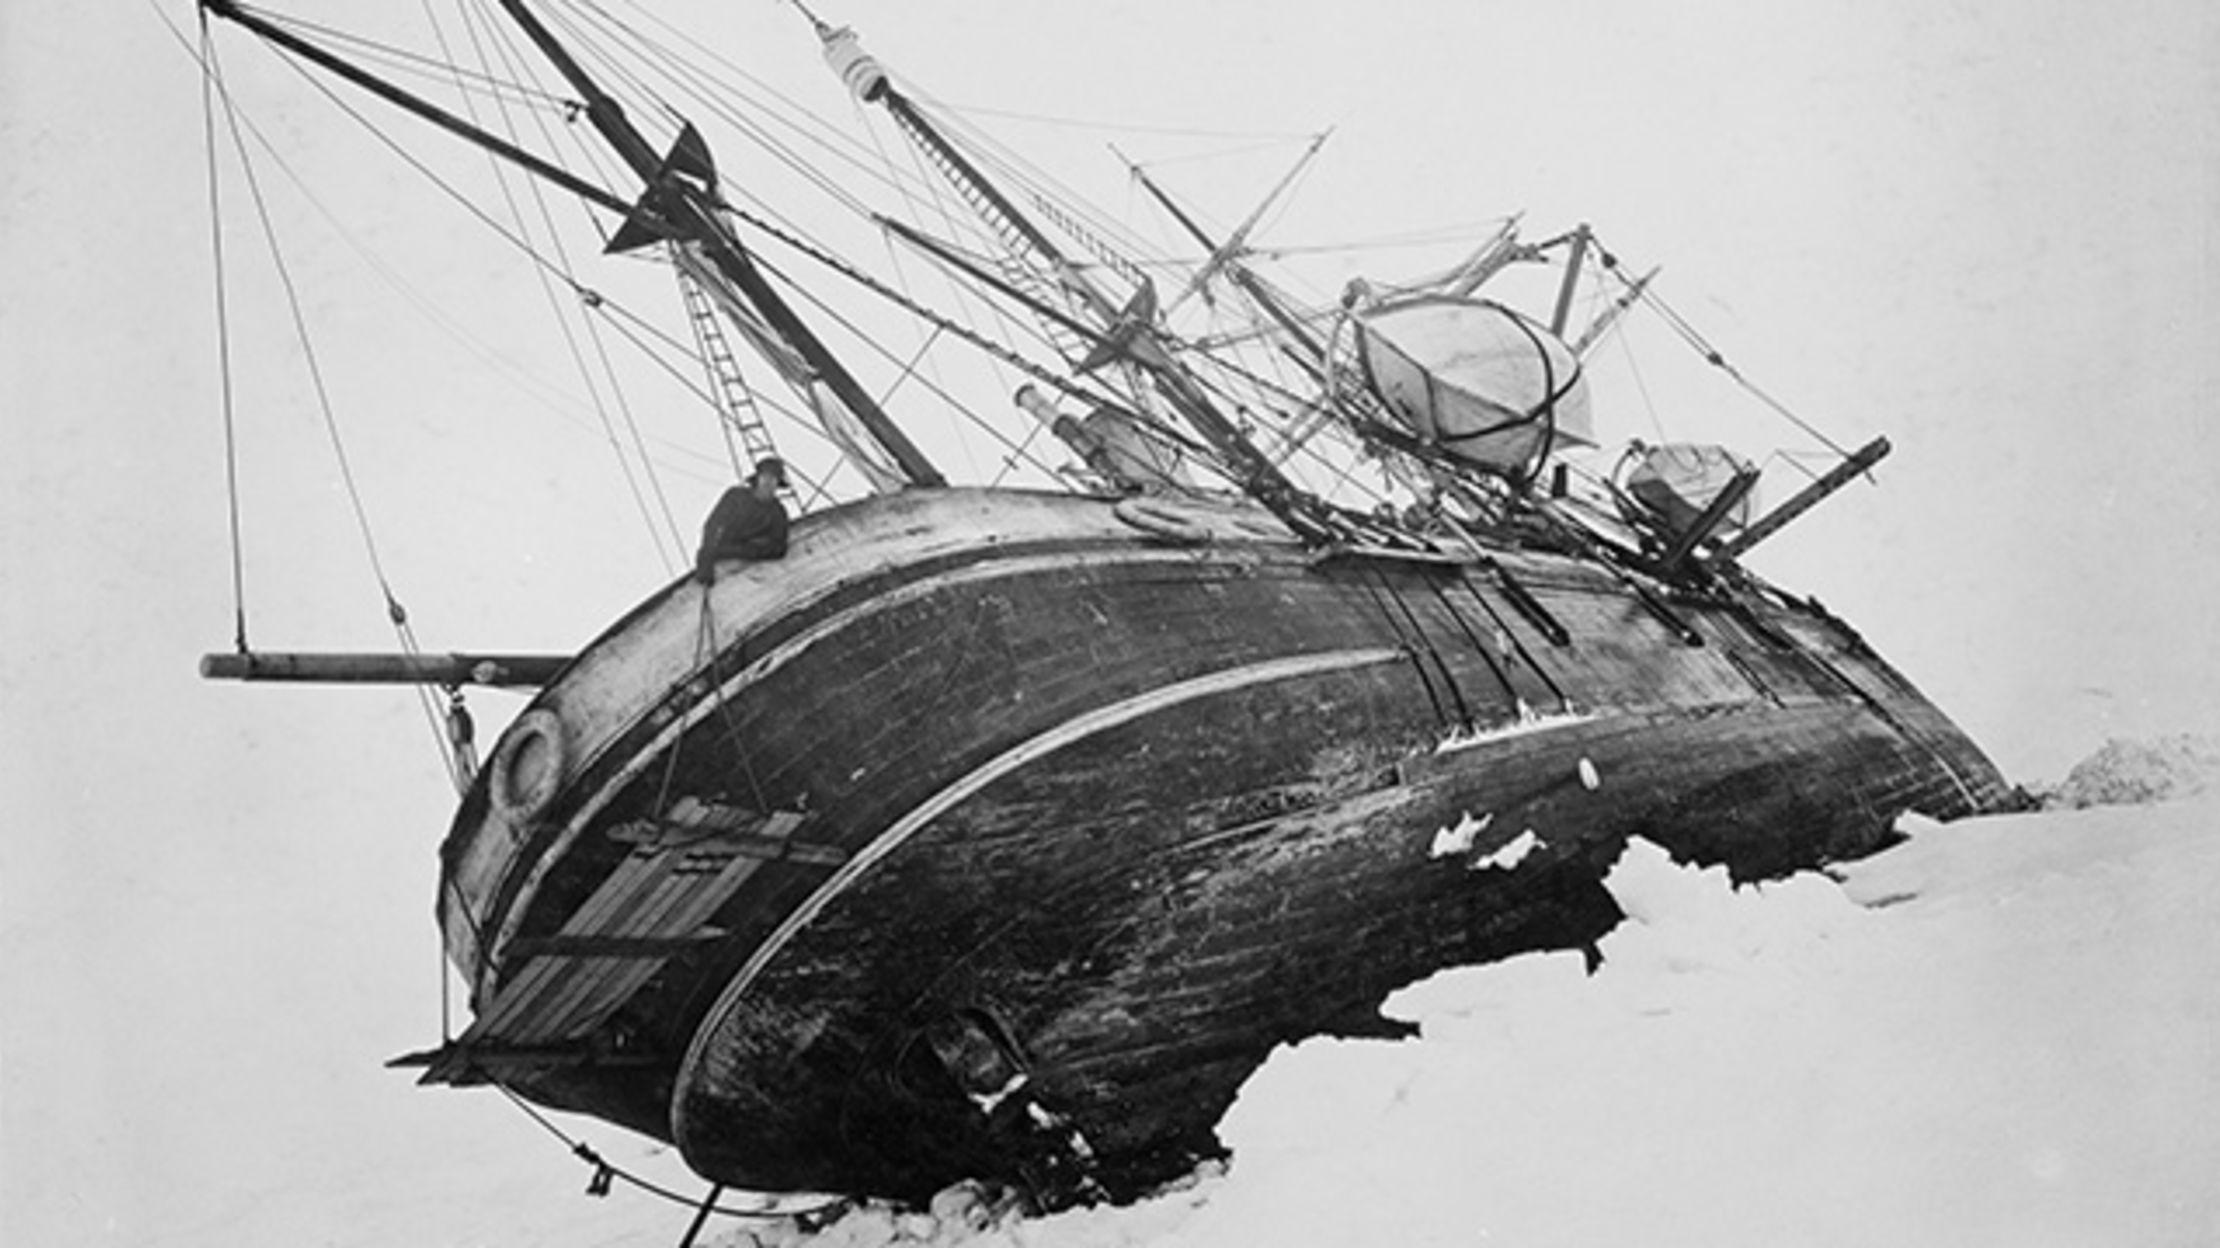 shackletons lost ship endurance - HD1200×800